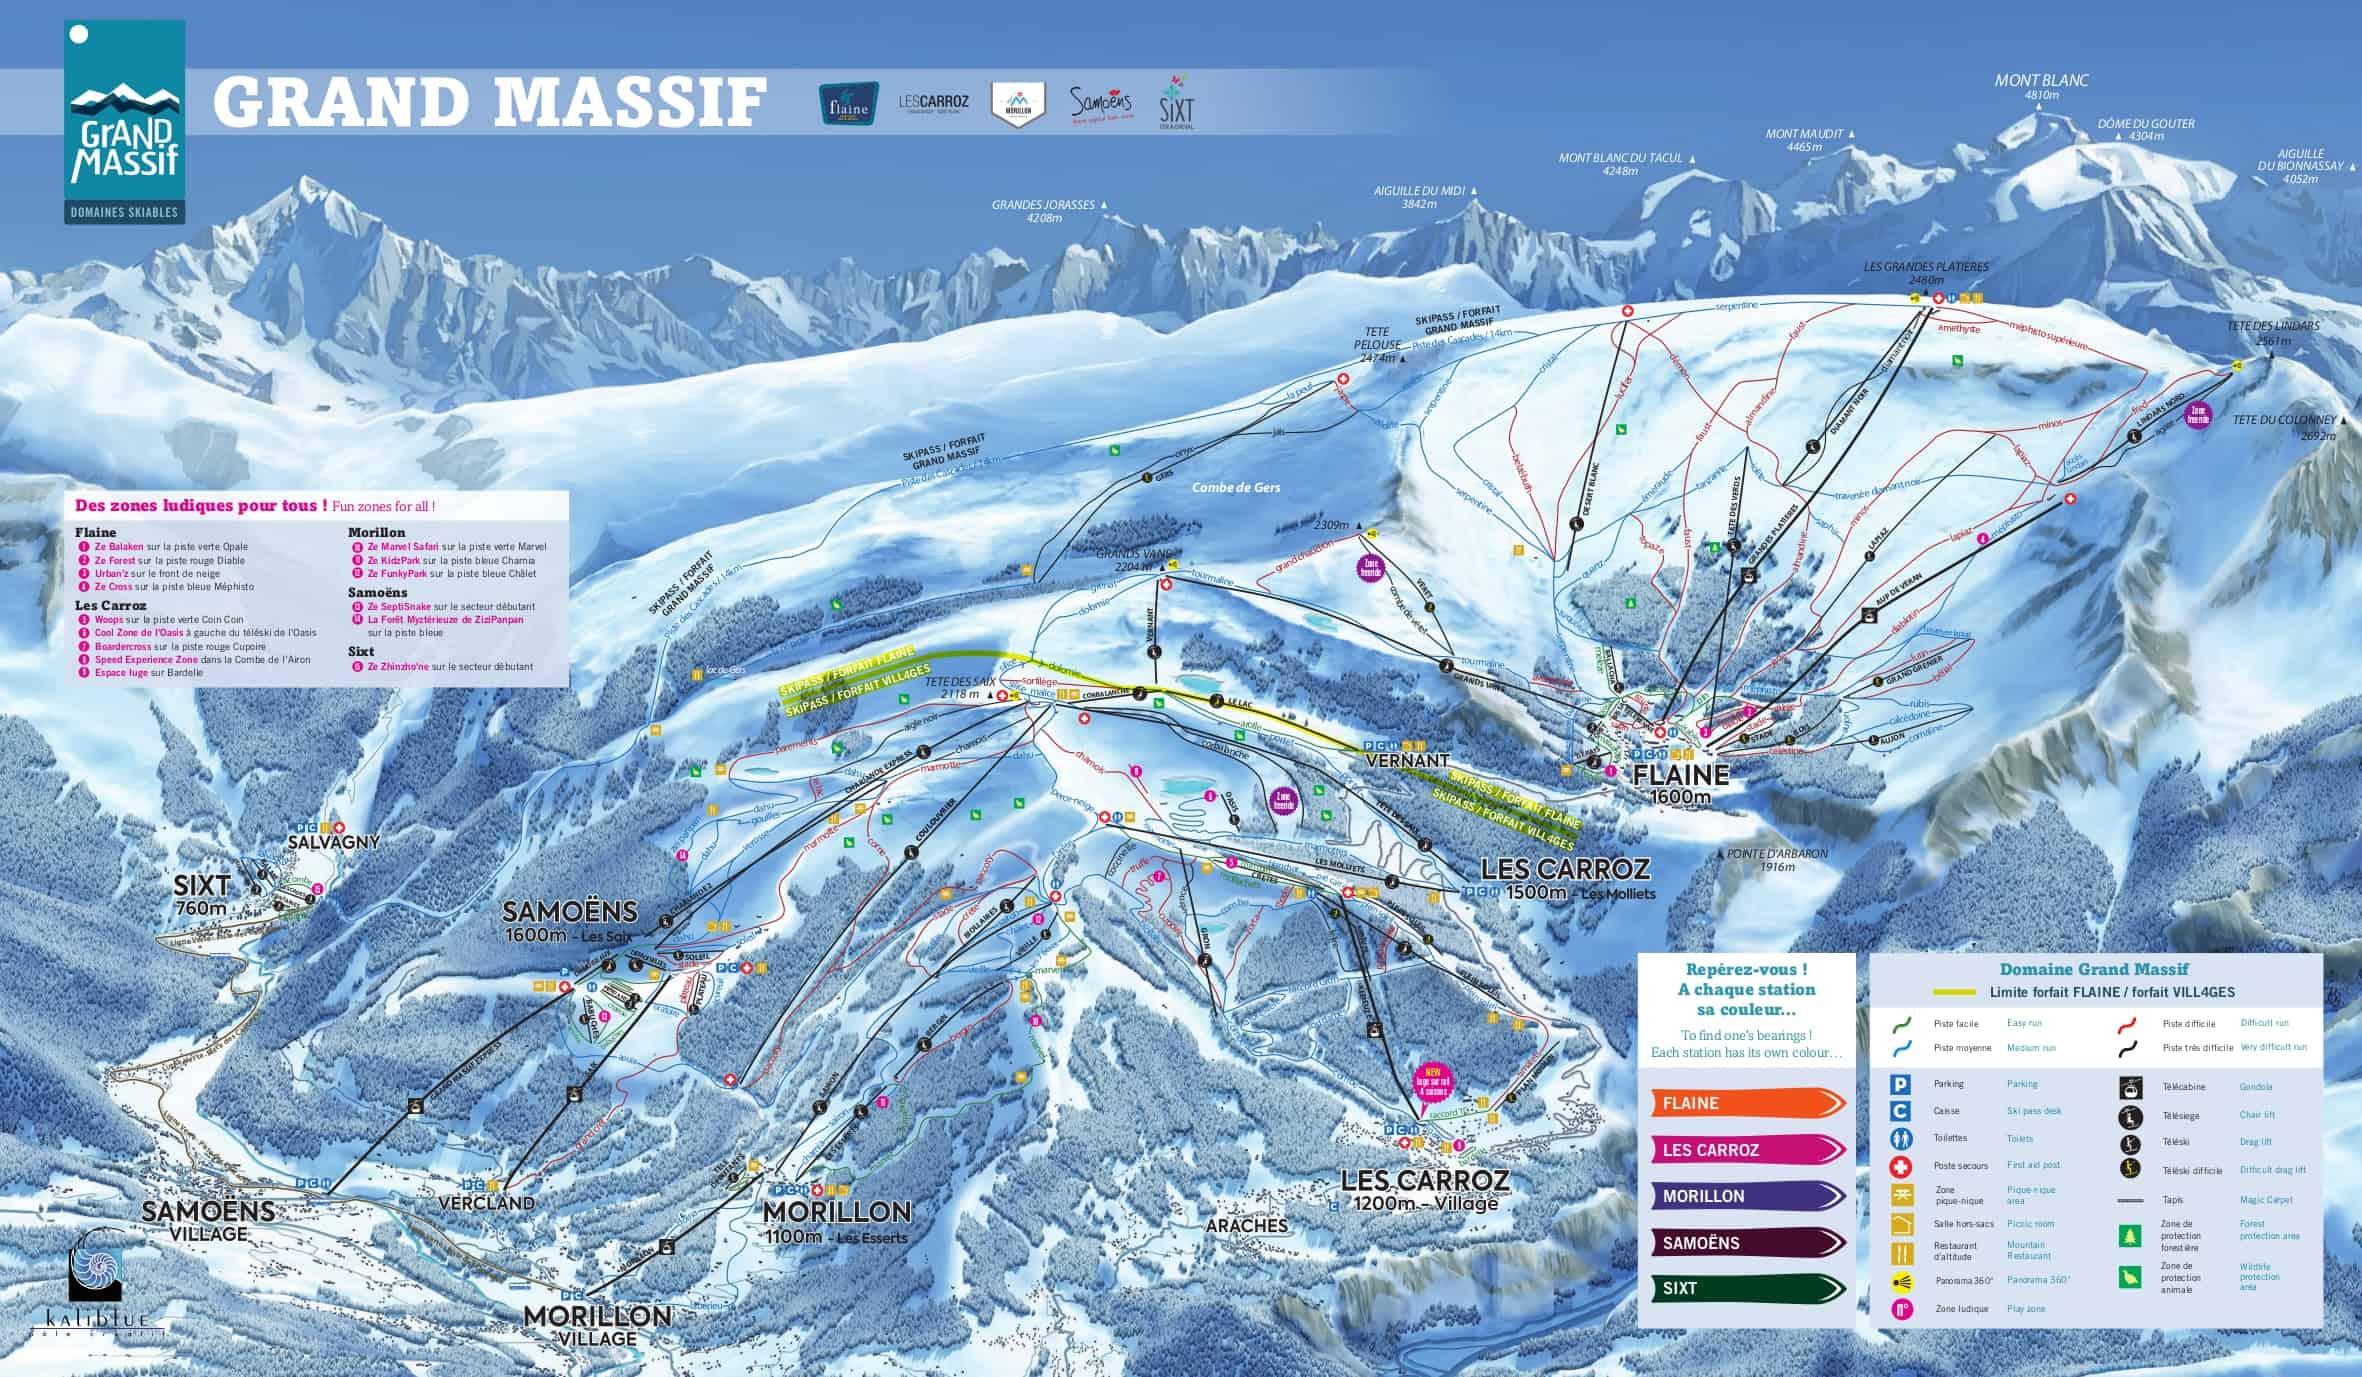 Le Grand Massif Ski JPG